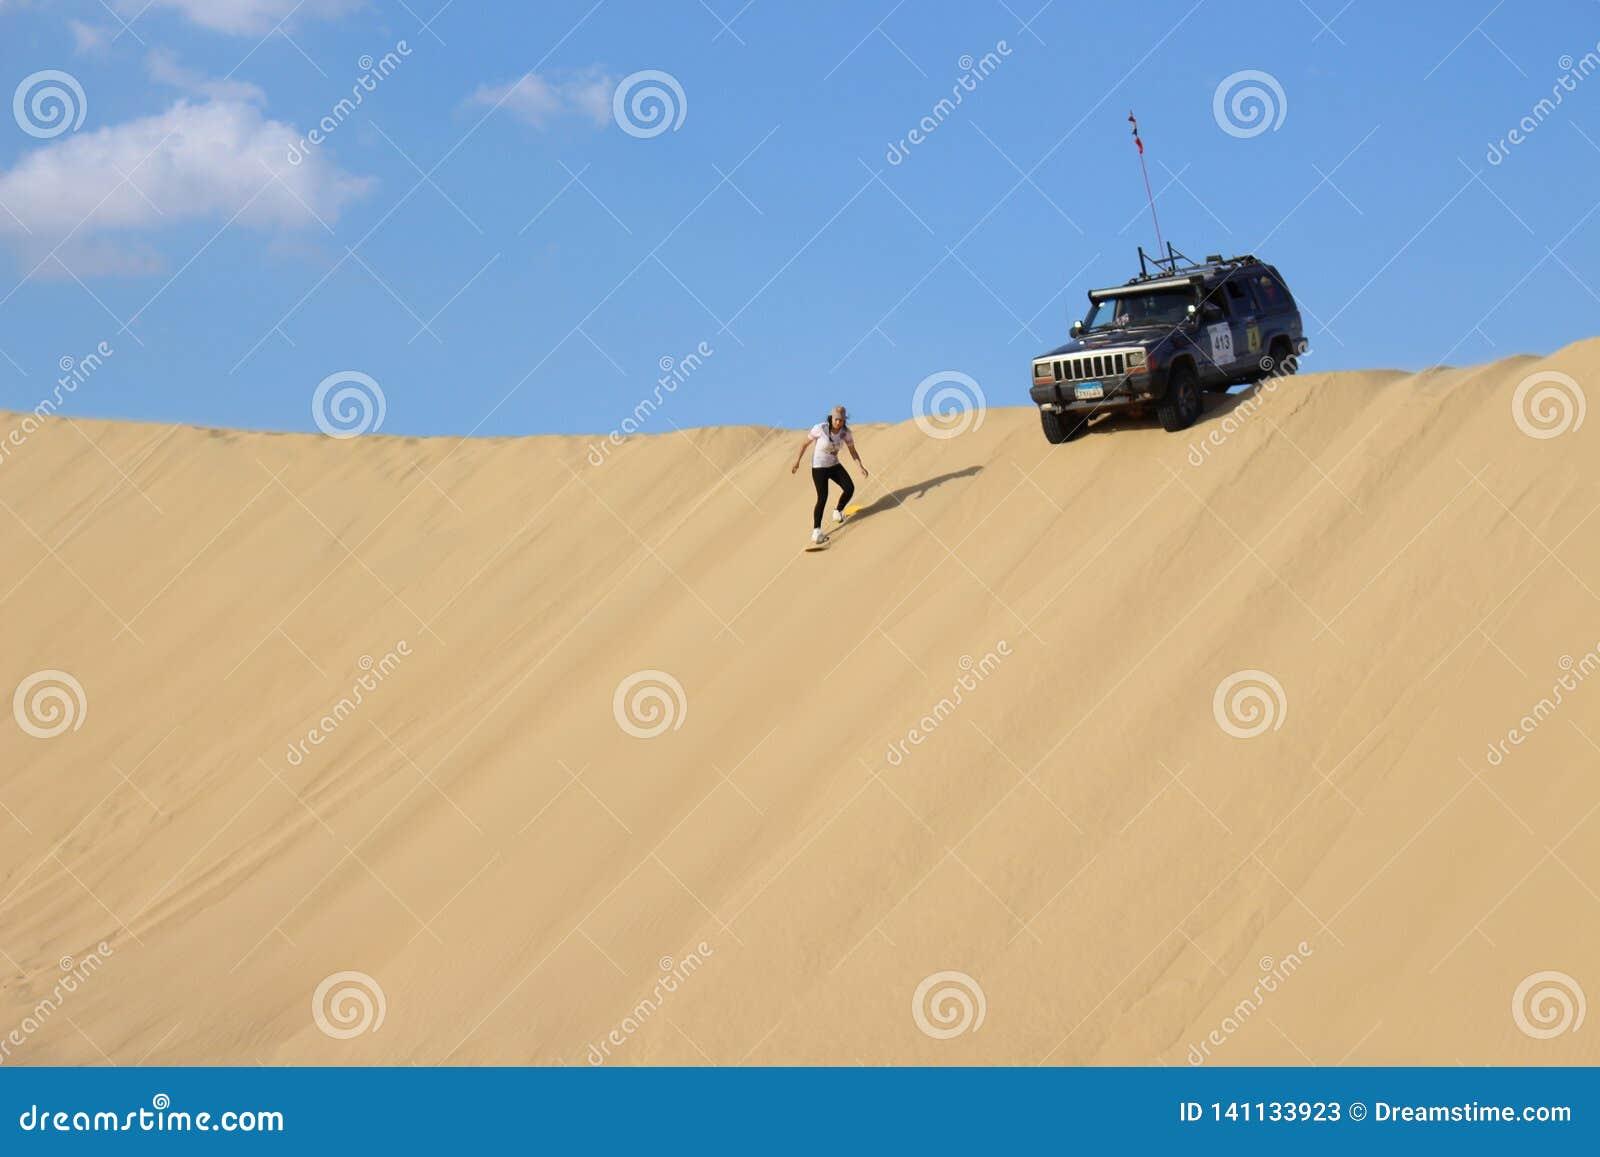 Sandboarding in the Faiyum desert